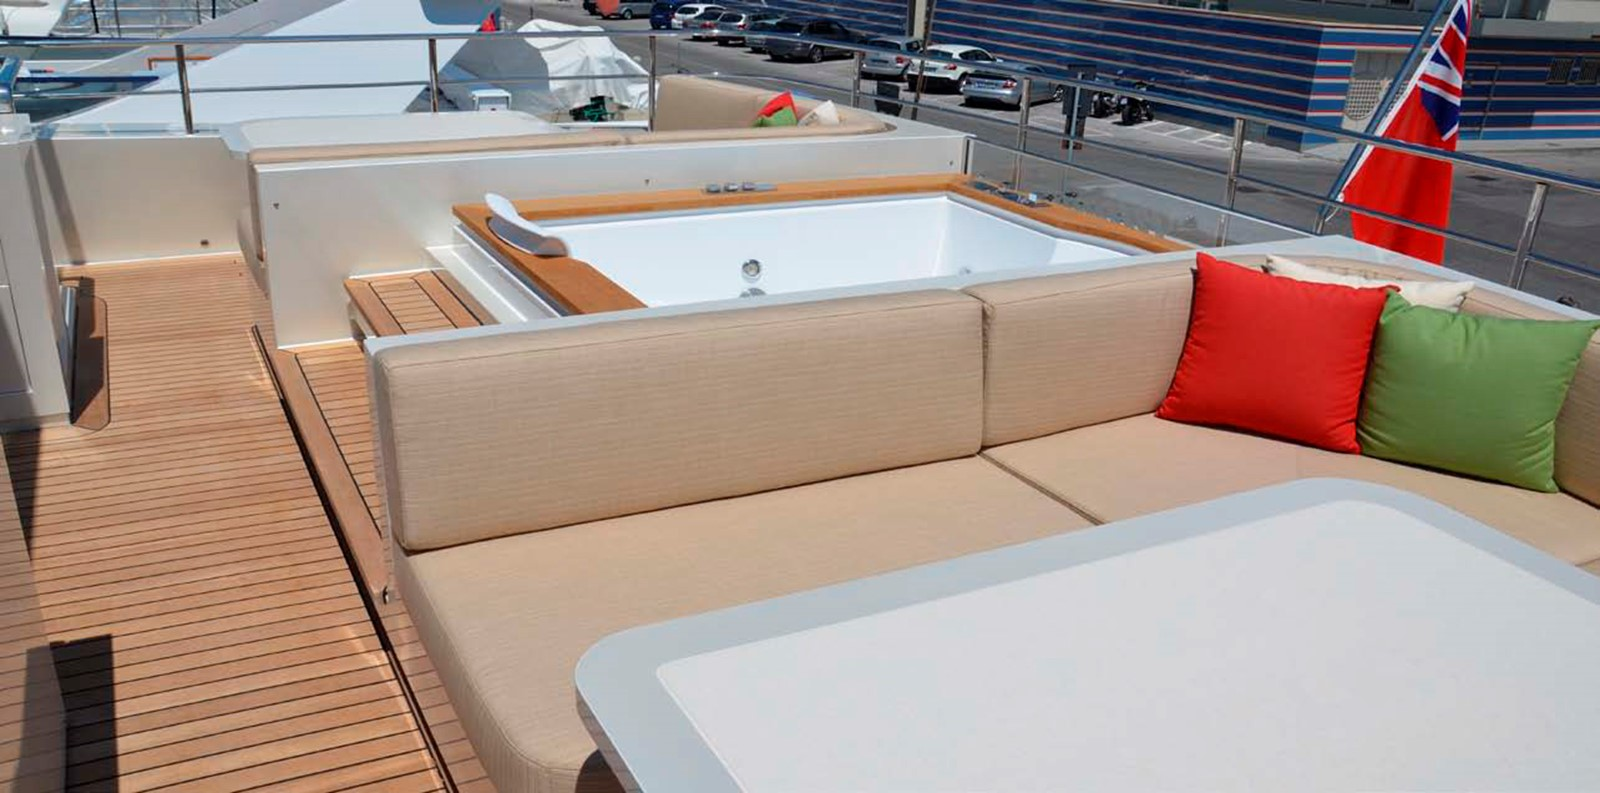 2013 SANLORENZO 40ALLOY Motor Yacht 1356925